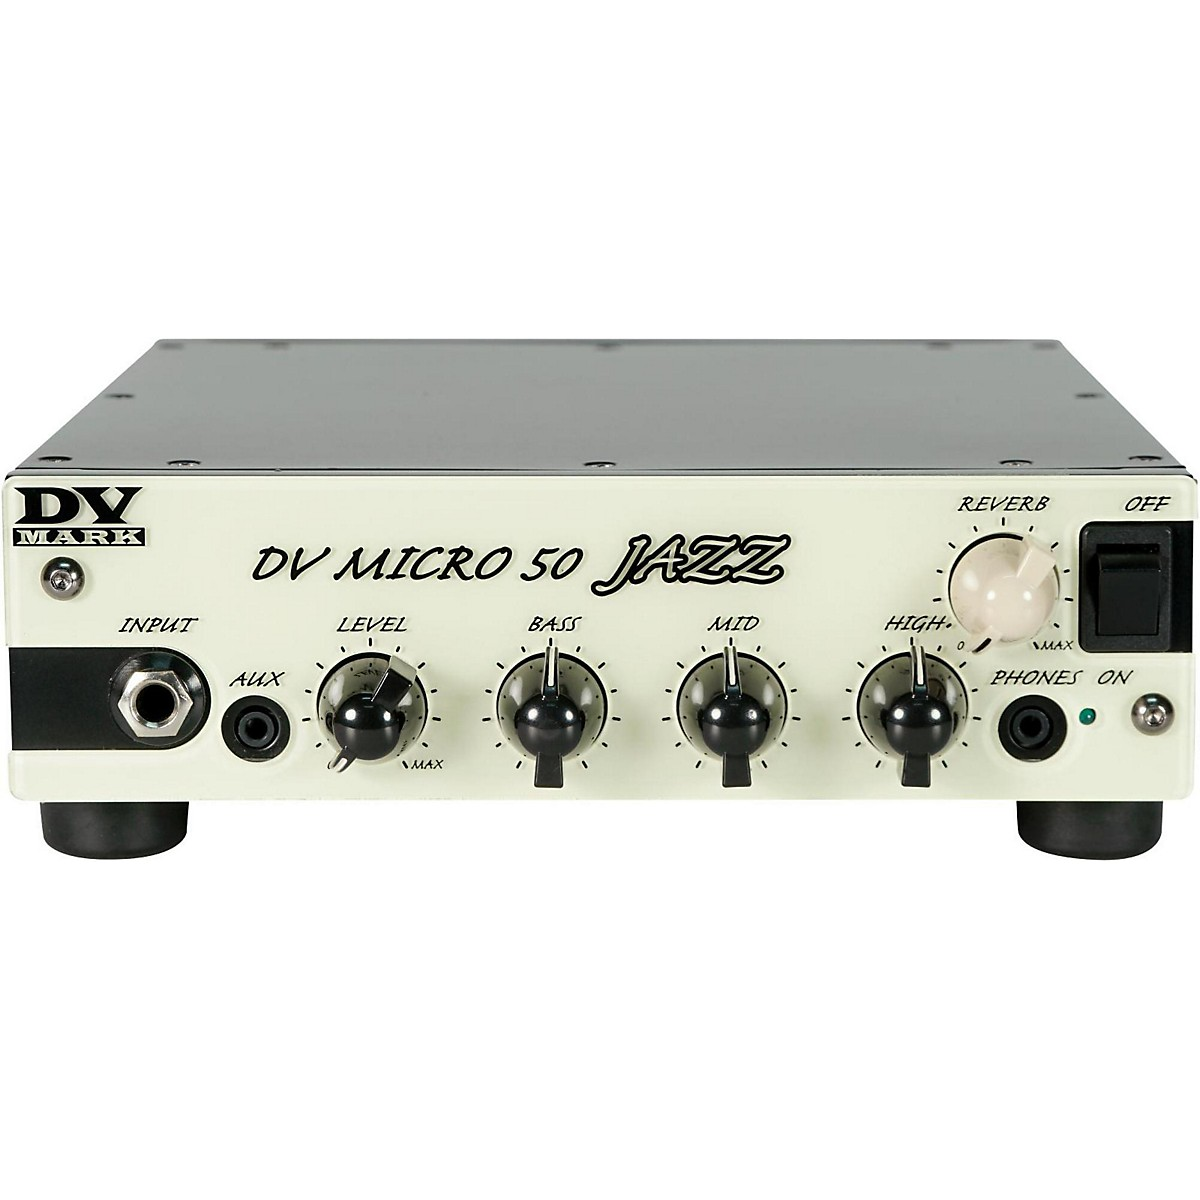 DV Mark Micro 50 Jazz 50W Guitar Amplifier Head